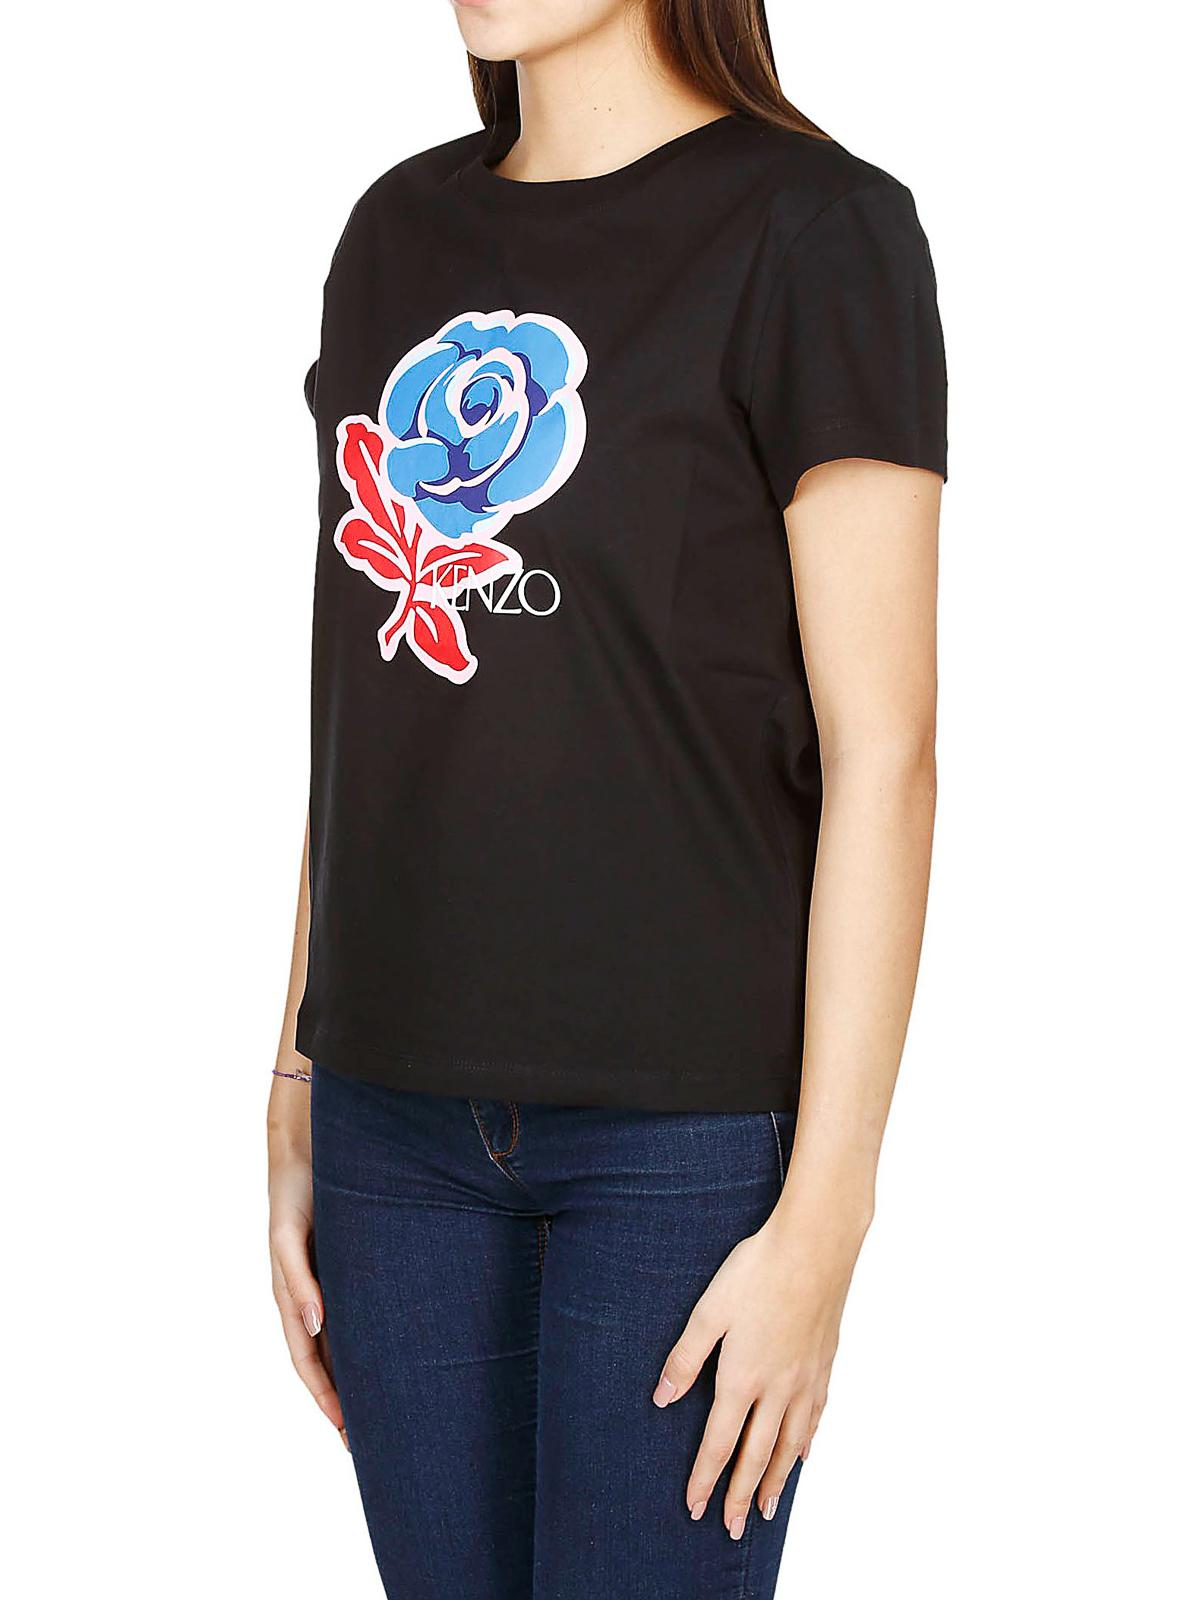 Roses Slim Fit Shirt T Kenzo 99 Shirts F952ts785990 eD9bE2YWIH